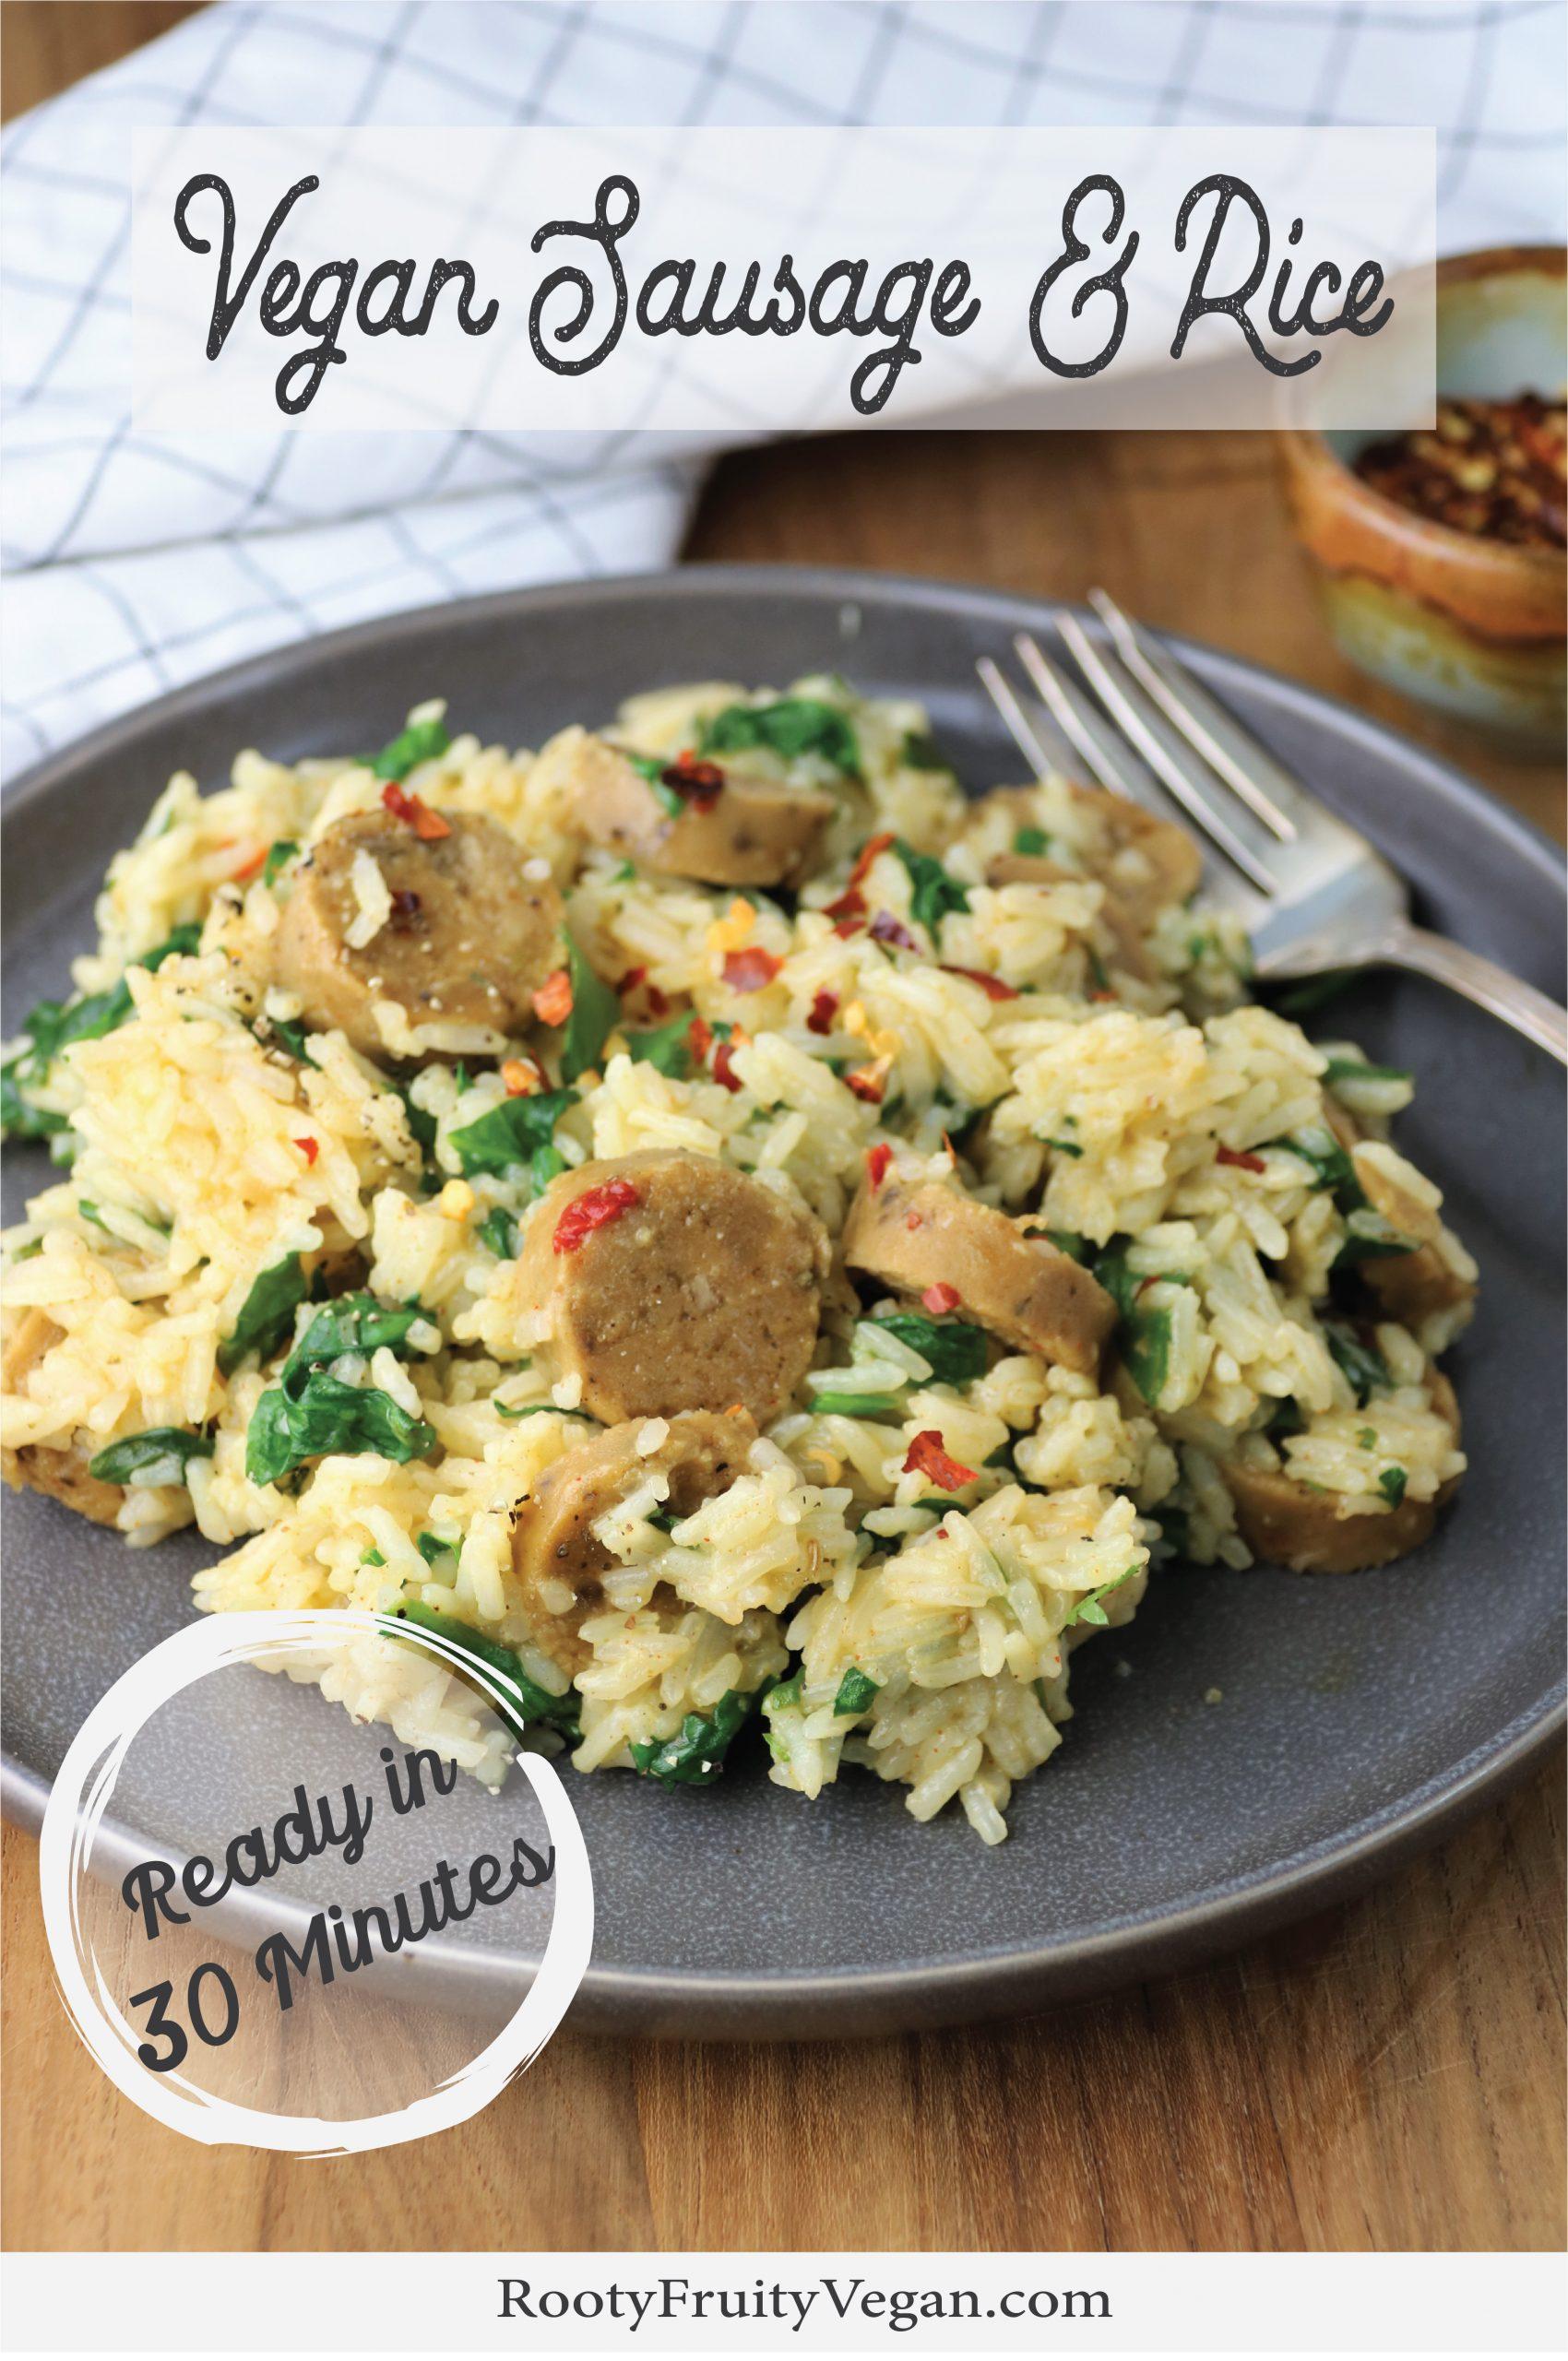 Vegan sausage and rice recipe